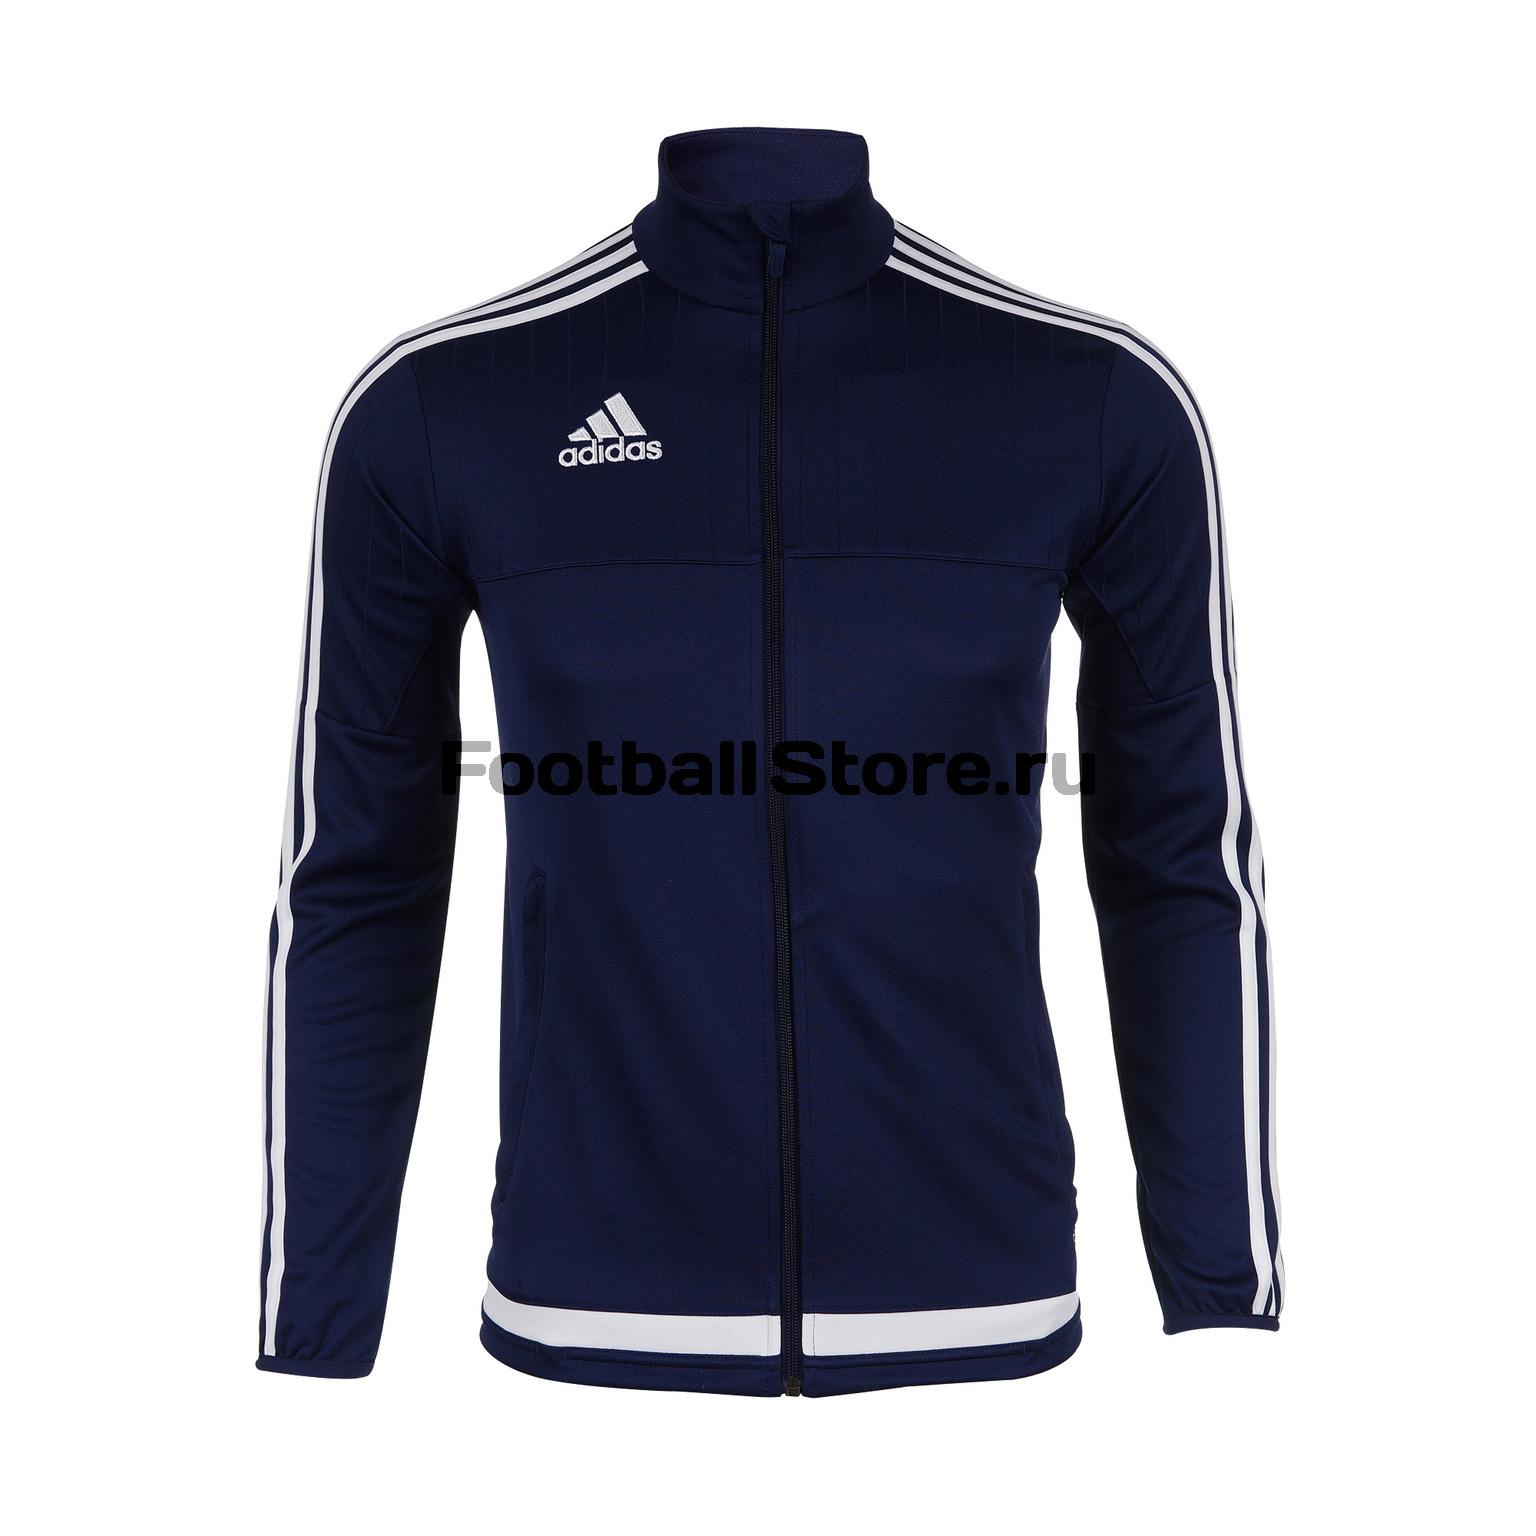 Adidas ������ Adidas Tiro15 TRG JKT S22316